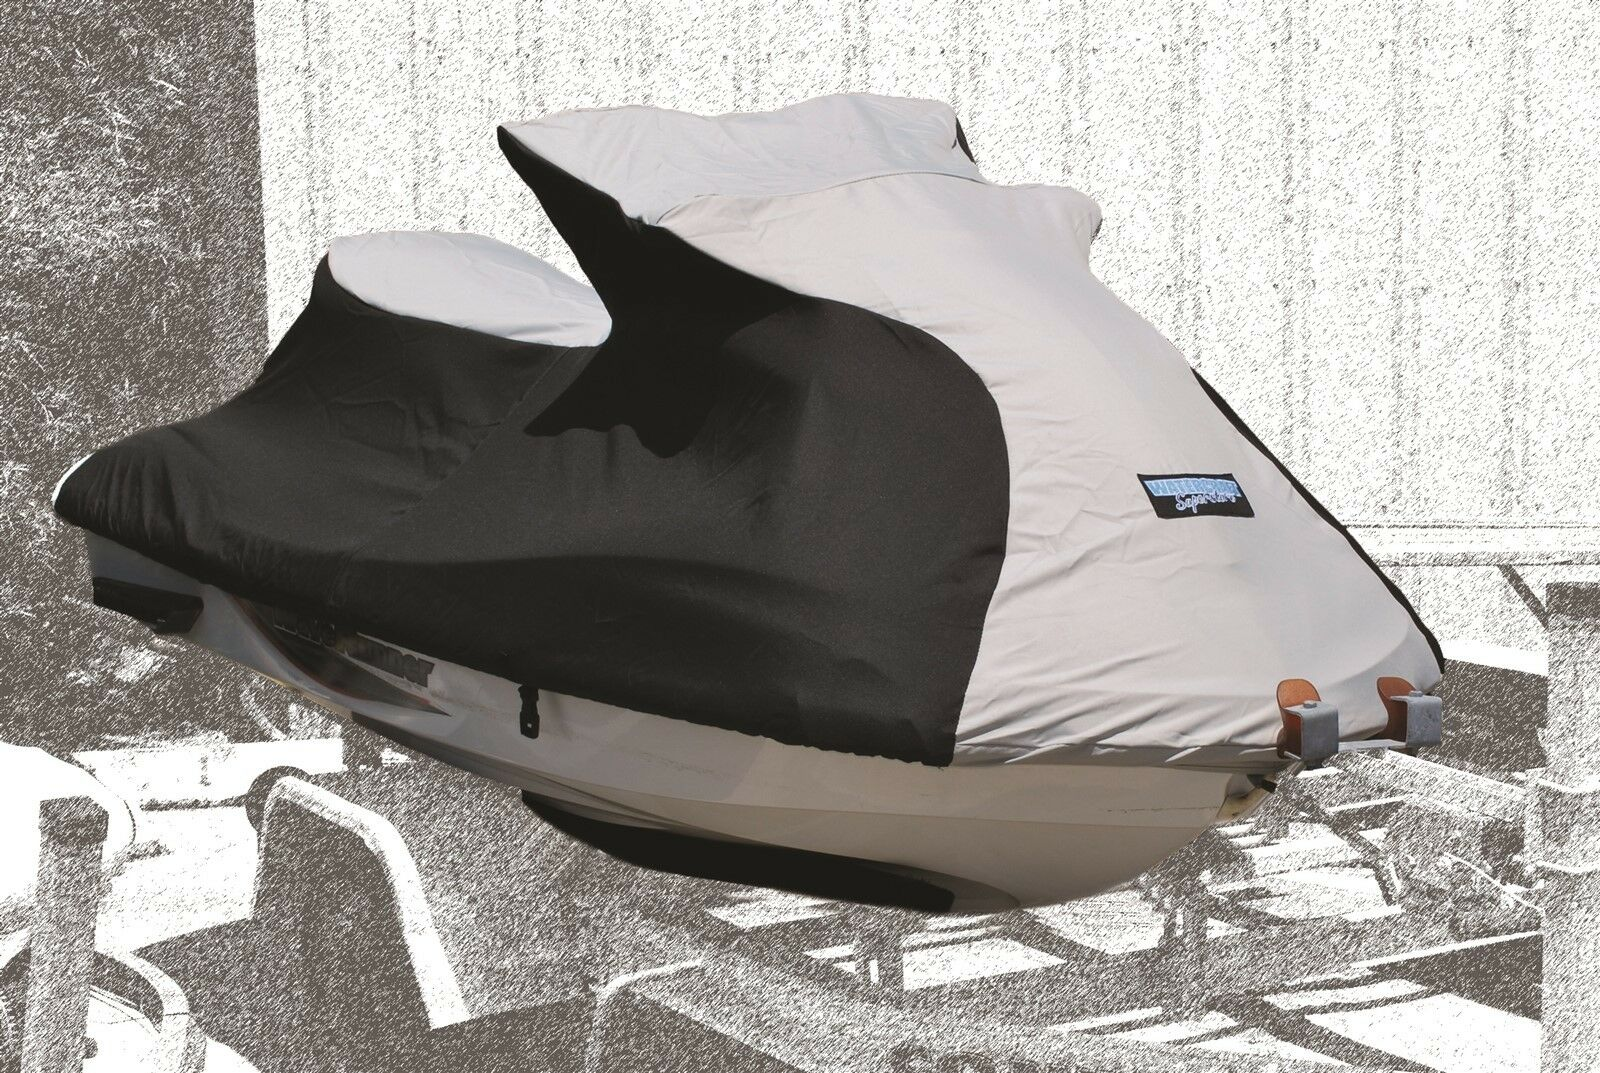 Yamaha Storage Cover 2000-2002 GP 1200R    2001-2005 GP800R    2003-2008 GP1300R